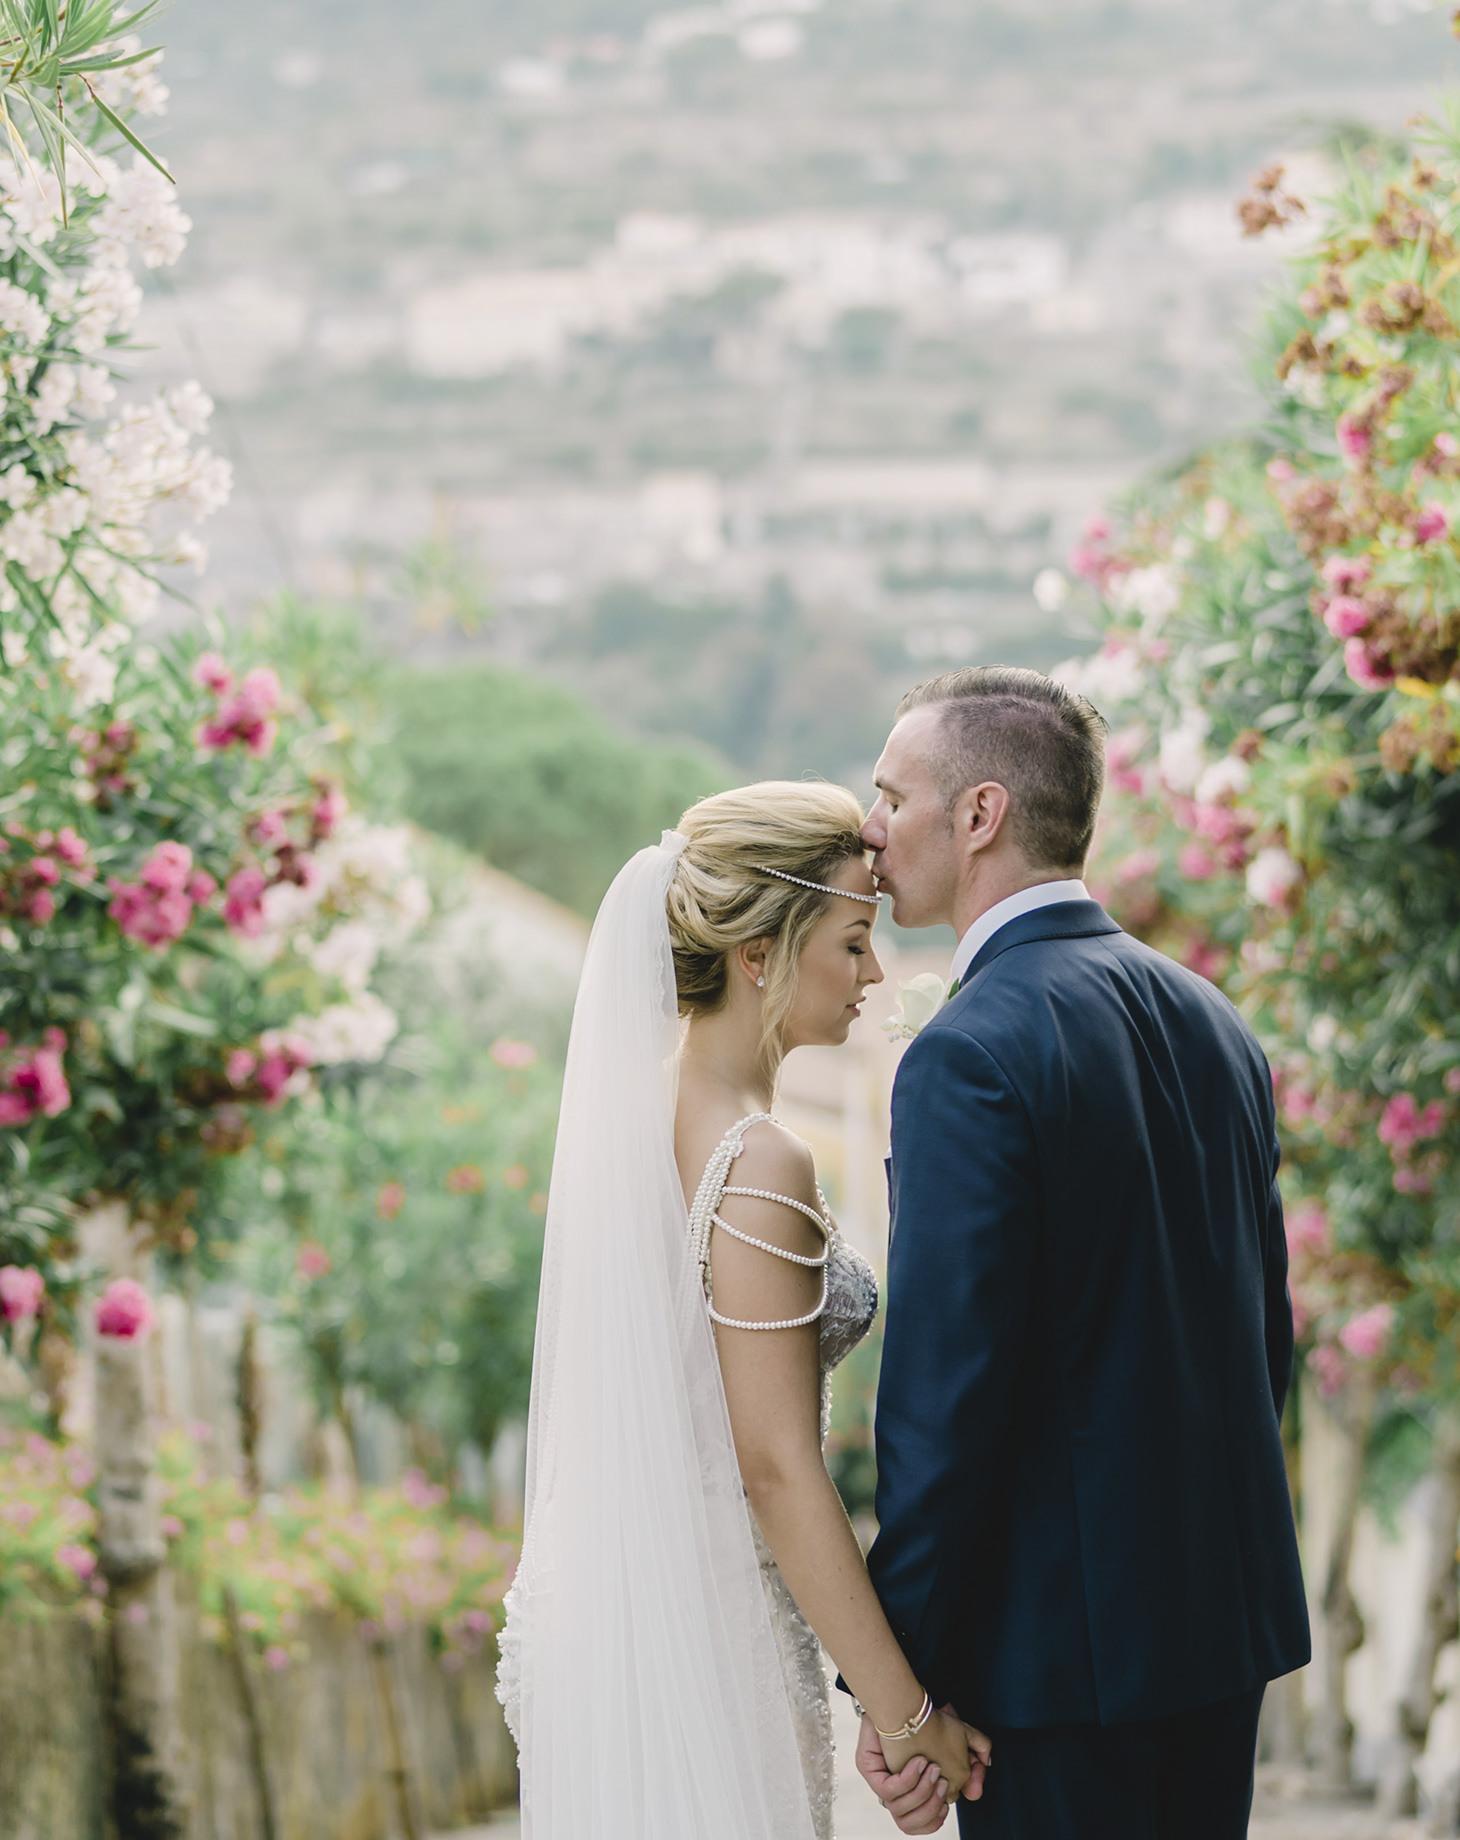 Emma & Sean | Ravello